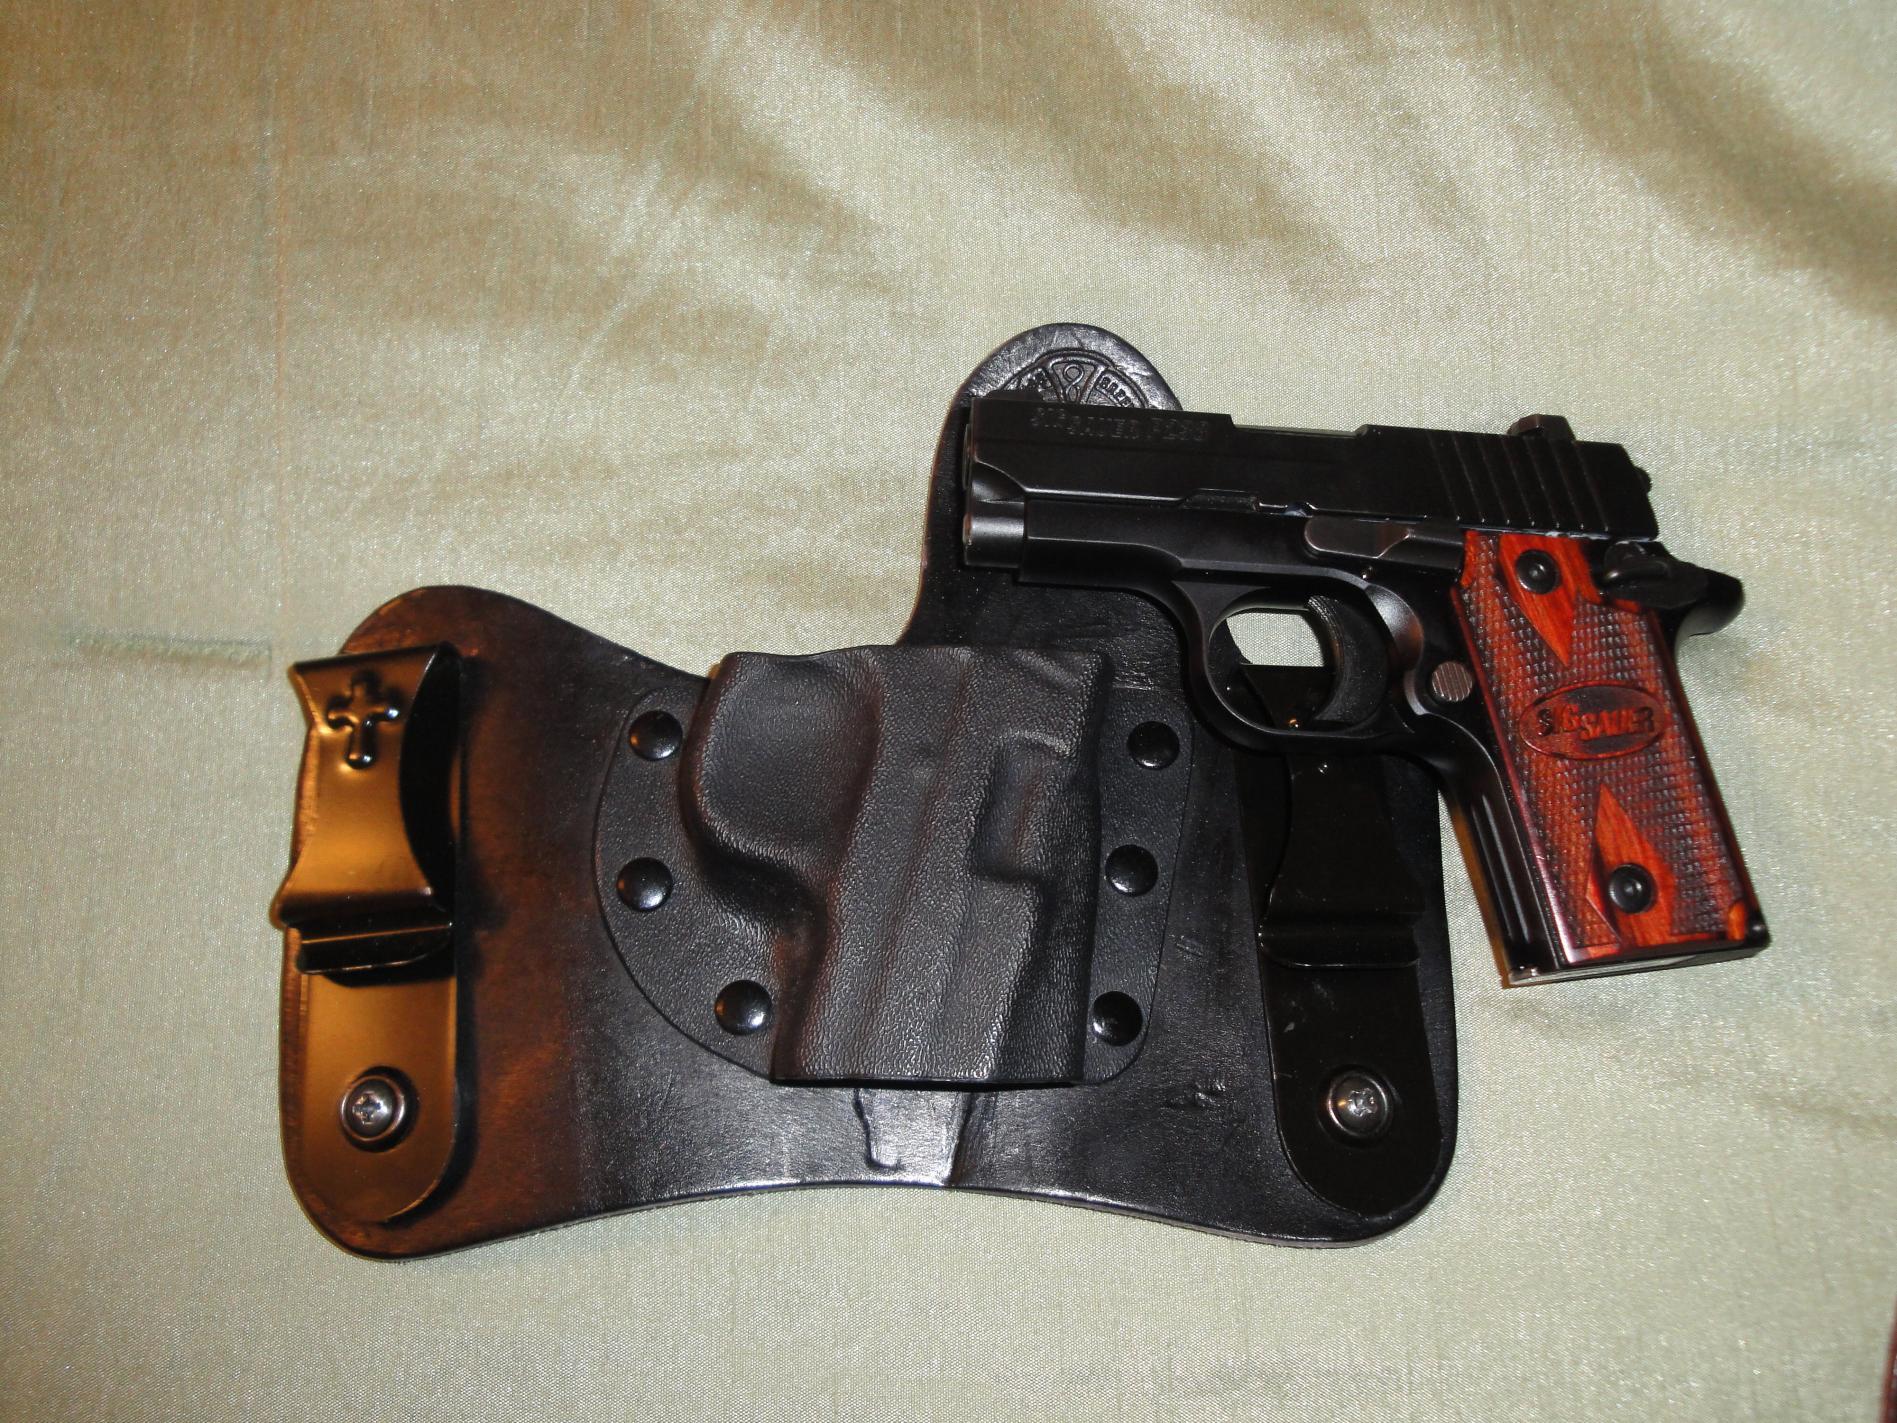 New owner of a Sig P238-guns-002.jpg